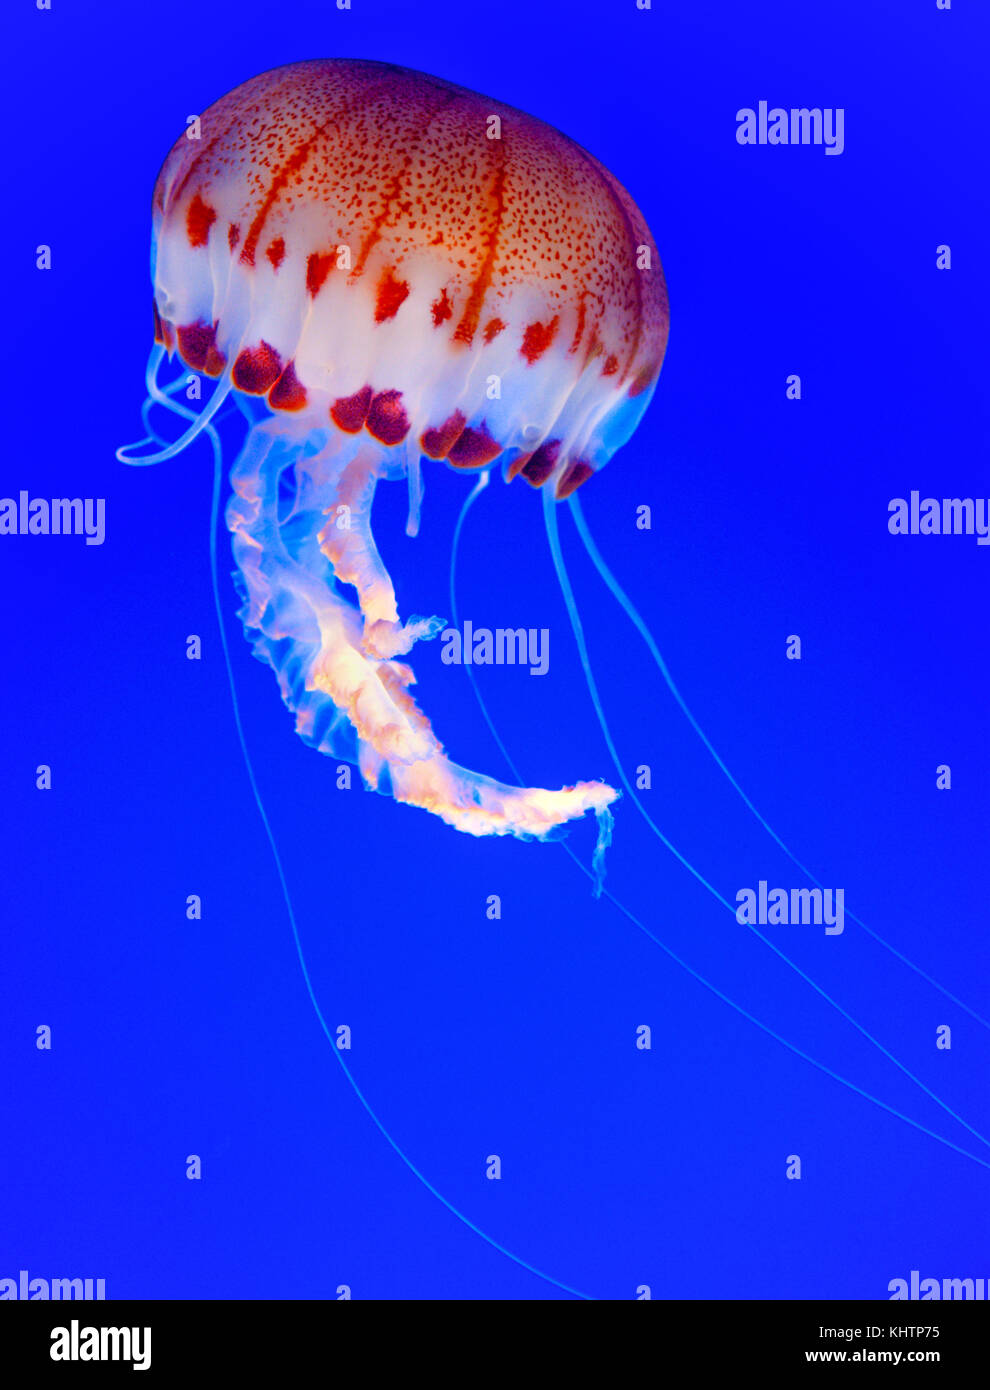 Un sorprendente jpurple-striped ellyfish (Chrysaora colorata) al Monterey Bay Aquarium, CA U.S.A. Foto Stock